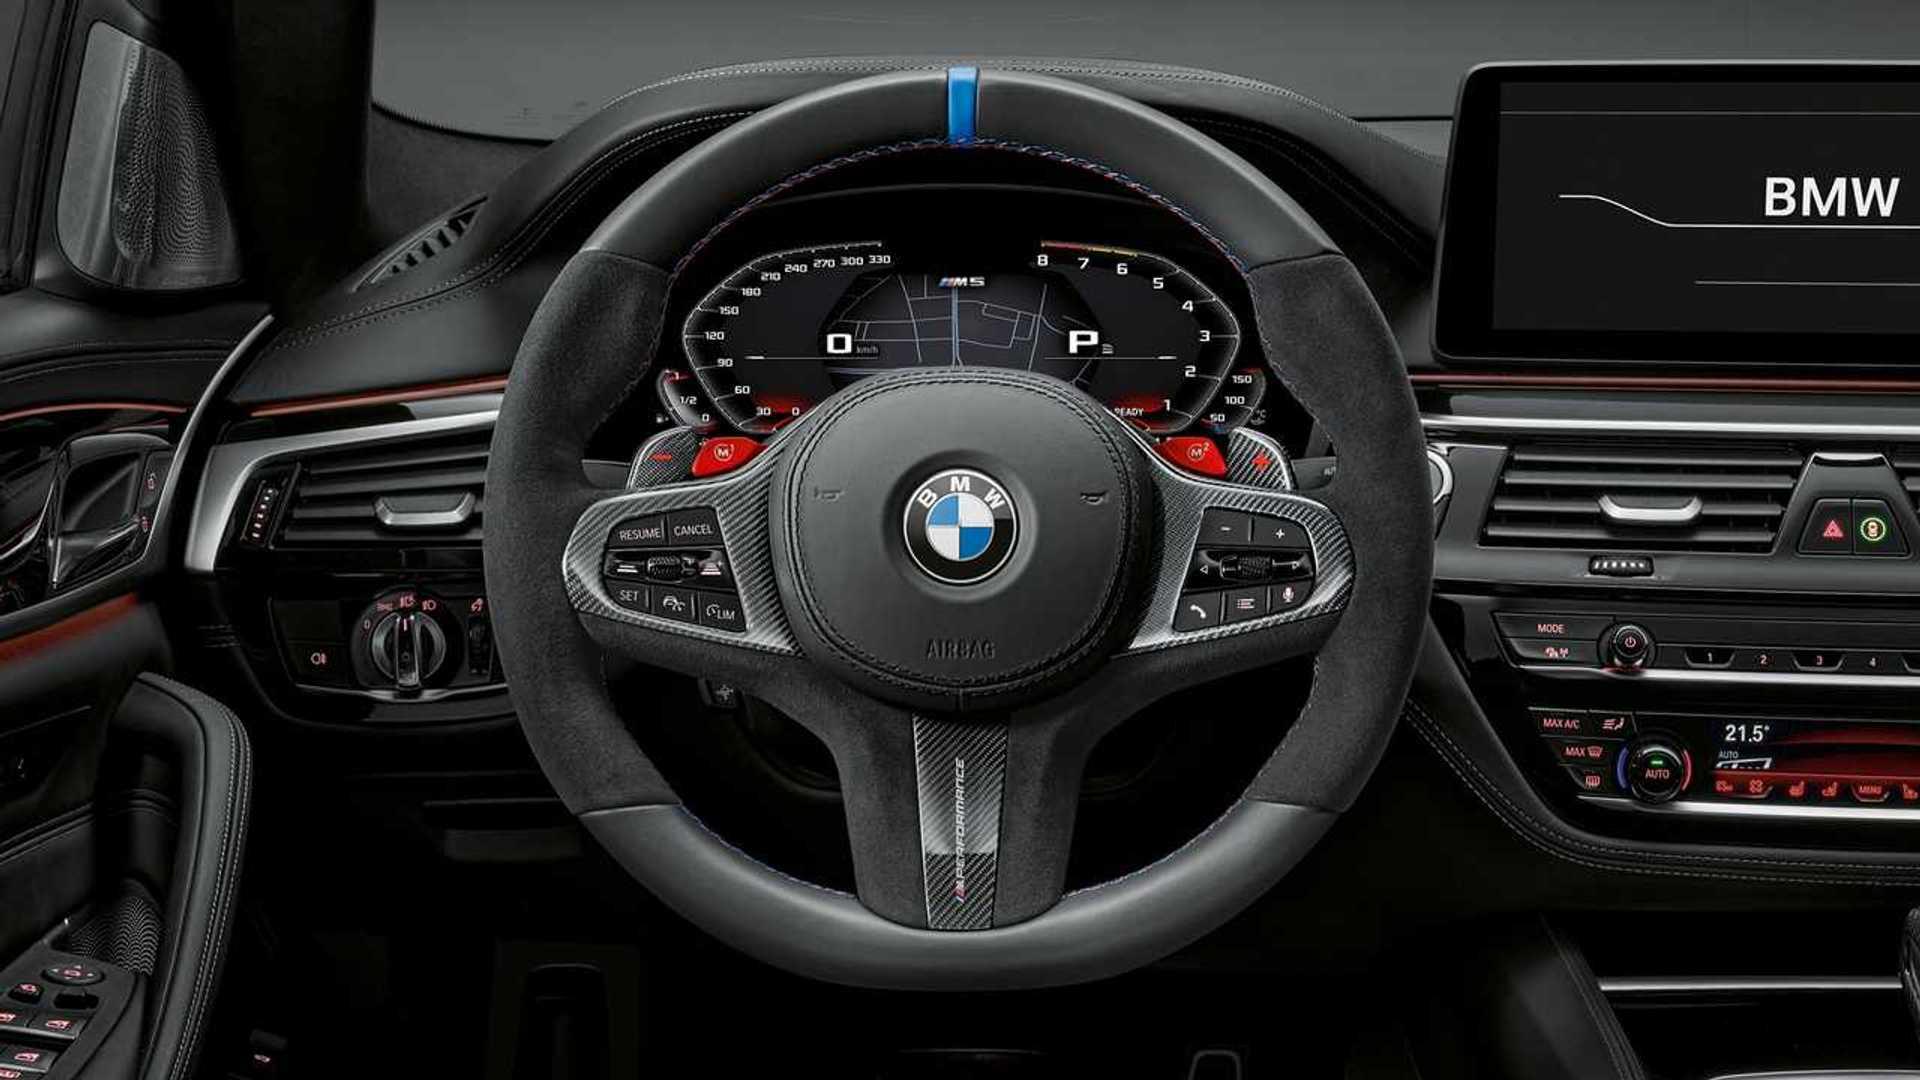 https://cdn.motor1.com/images/mgl/Npvej/s1/m-performance-parts-fur-m5-competition-2020.jpg